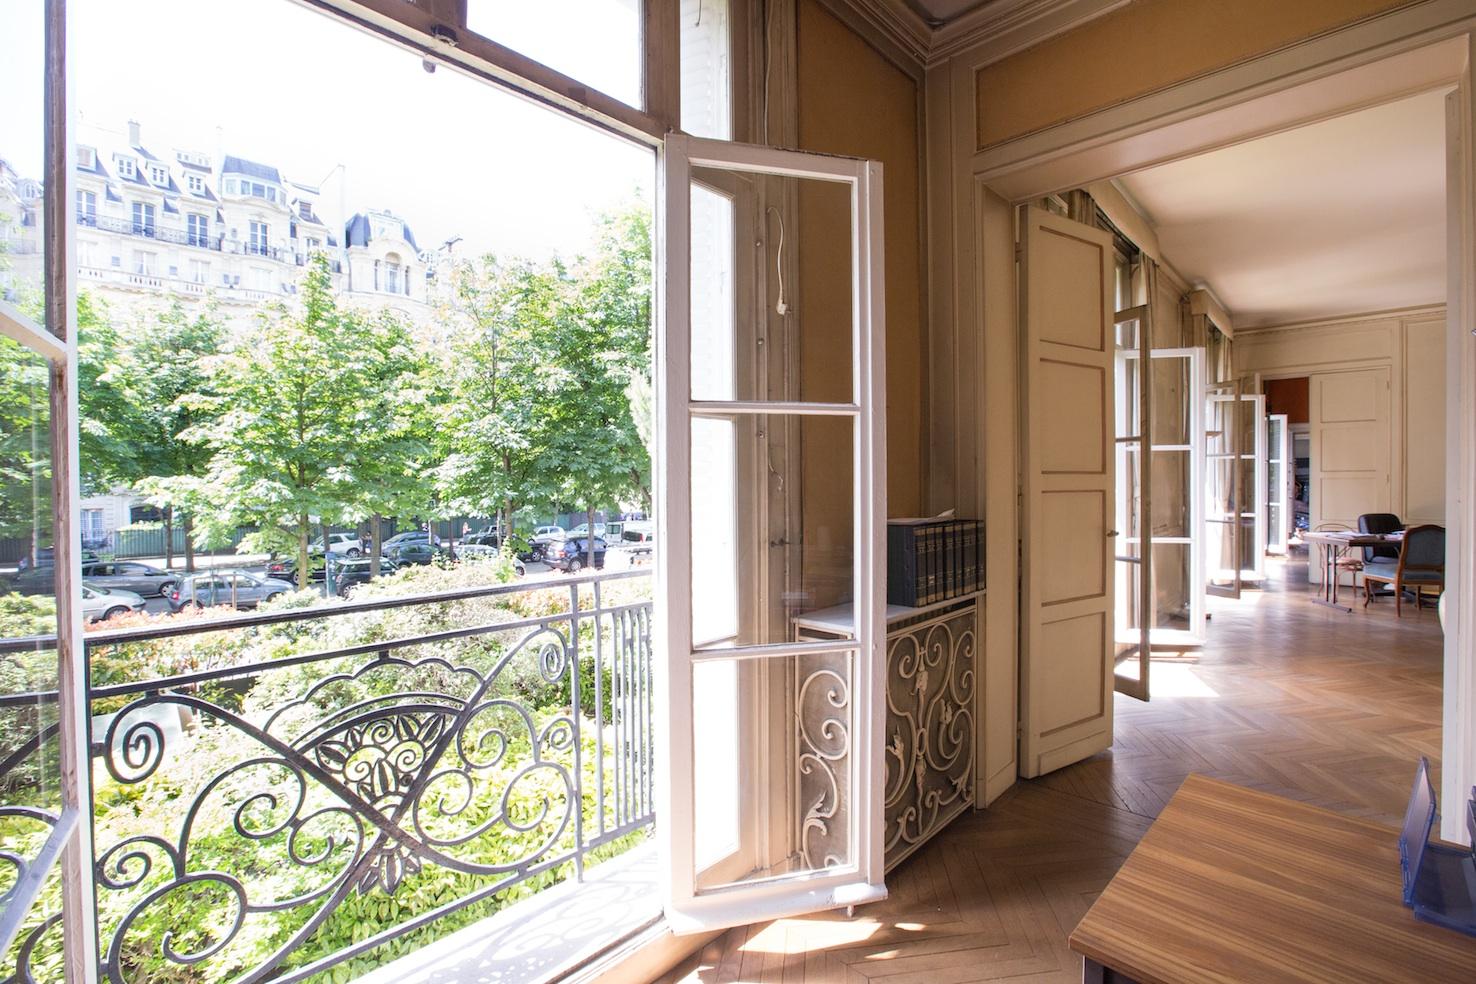 Apartamento por un Venta en Mairie du 16è - id. 1042 Square Lamartine Paris, Paris 75016 Francia